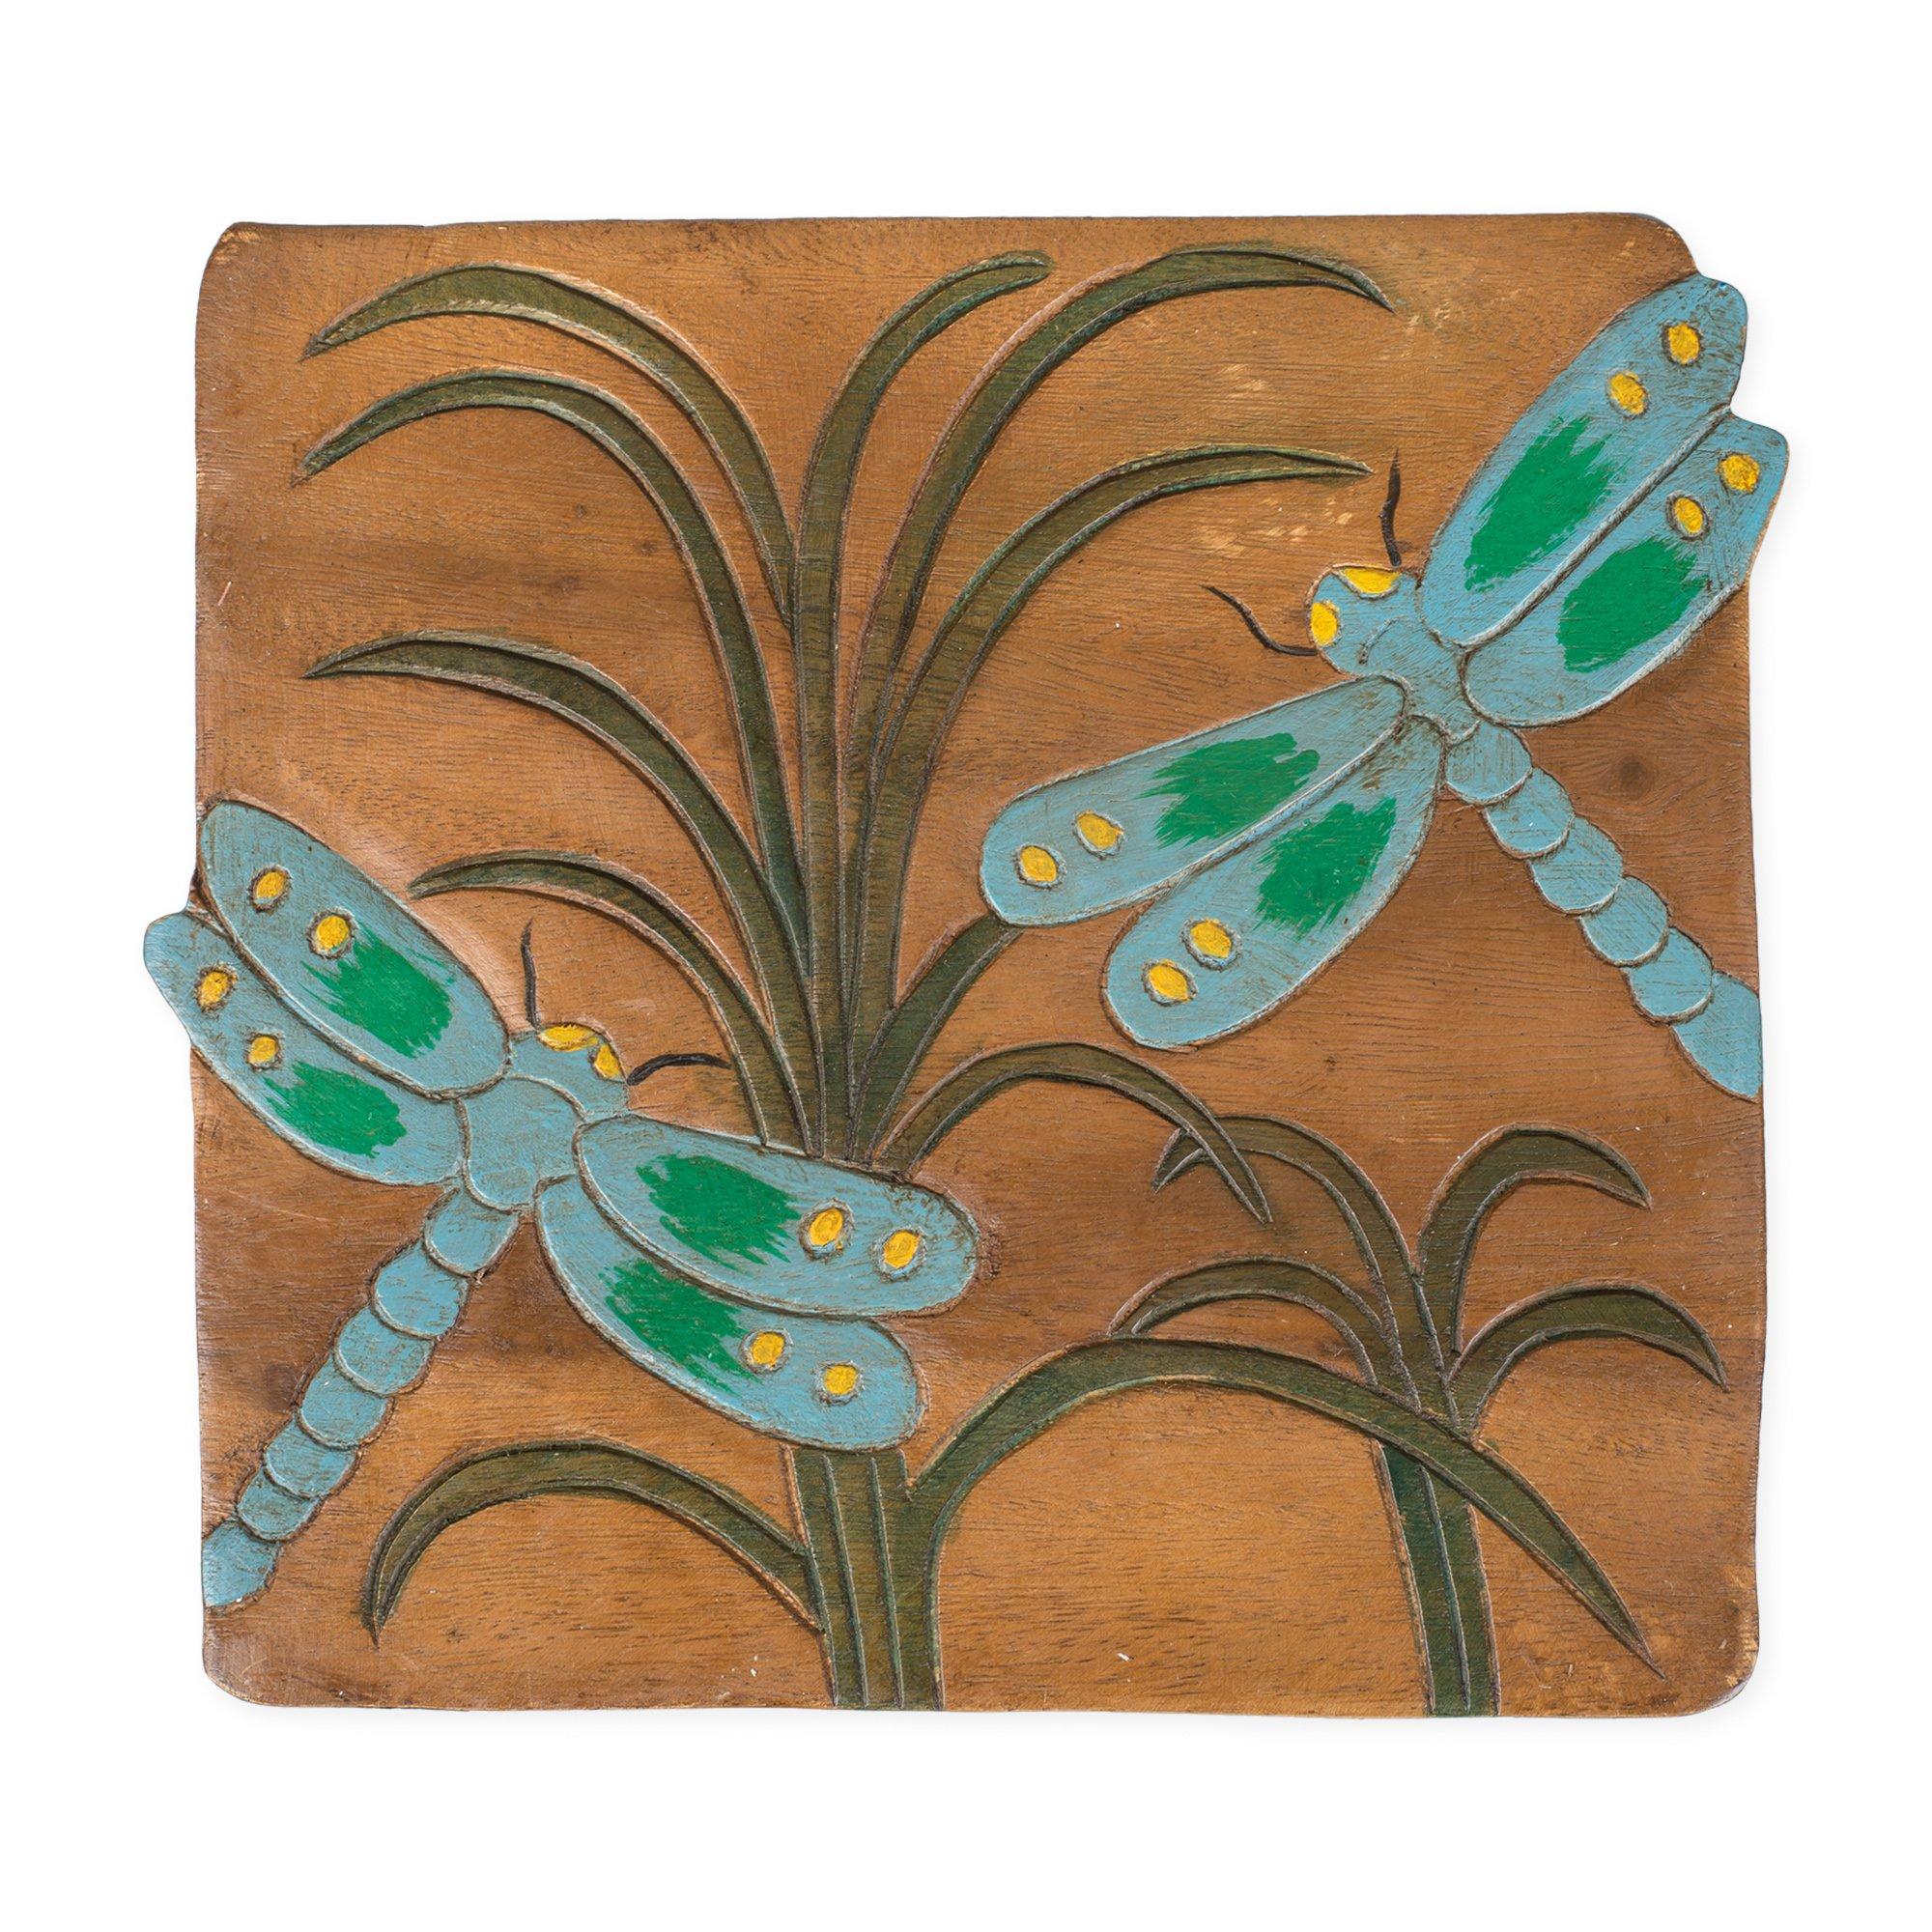 Dragonfly Design Hand Carved Acacia Hardwood Decorative Short Stool by Sea Island (Image #4)